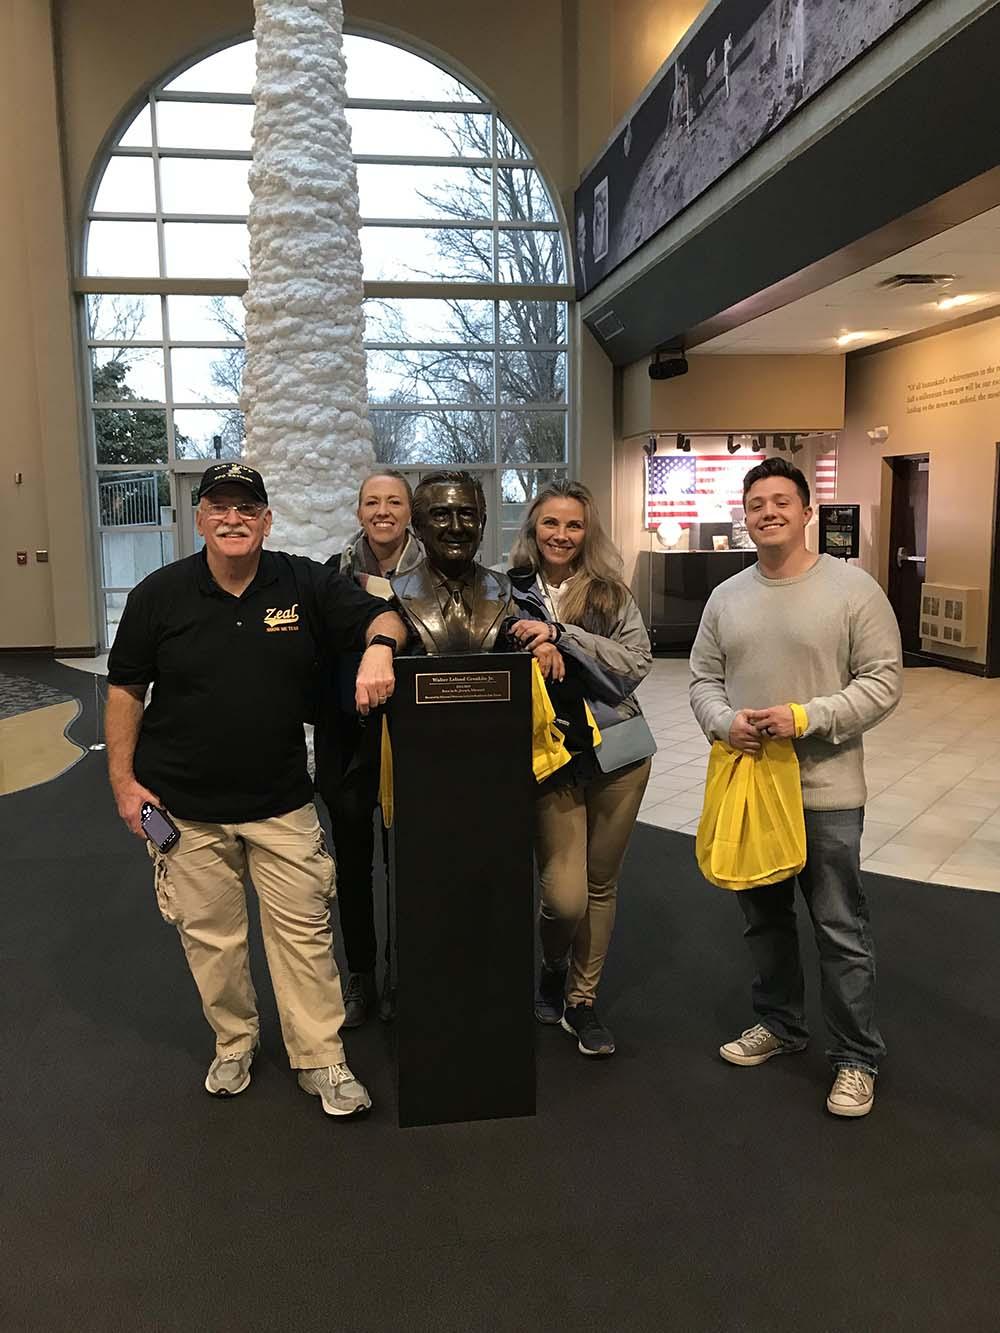 Veterans Upward Bound toured the Walter Cronkite Memorial at Missouri Western